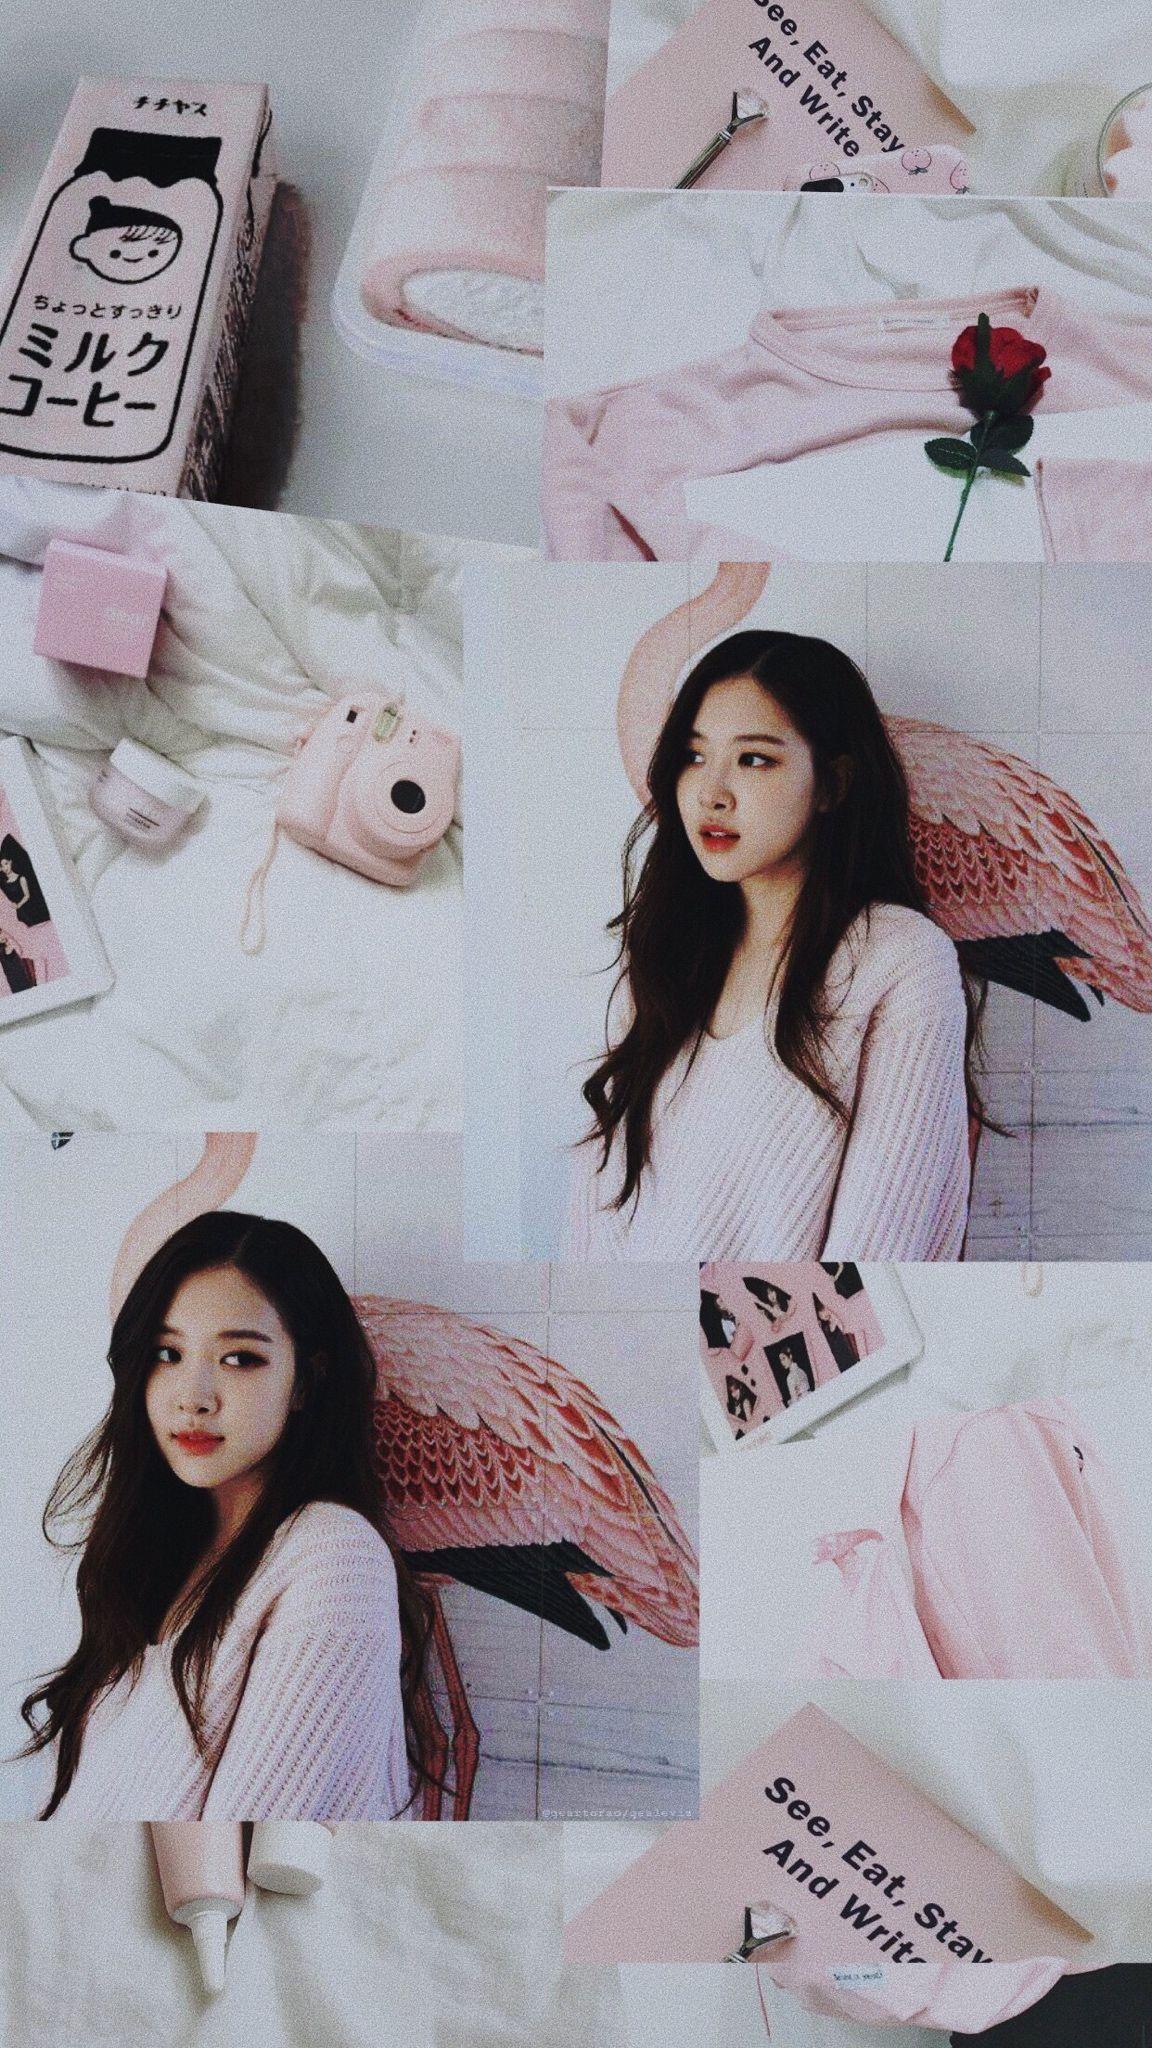 Rose Blackpink Wallpaper Hd 4k In 2020 Instagram Wallpaper Rose Wallpaper Kpop Wallpaper